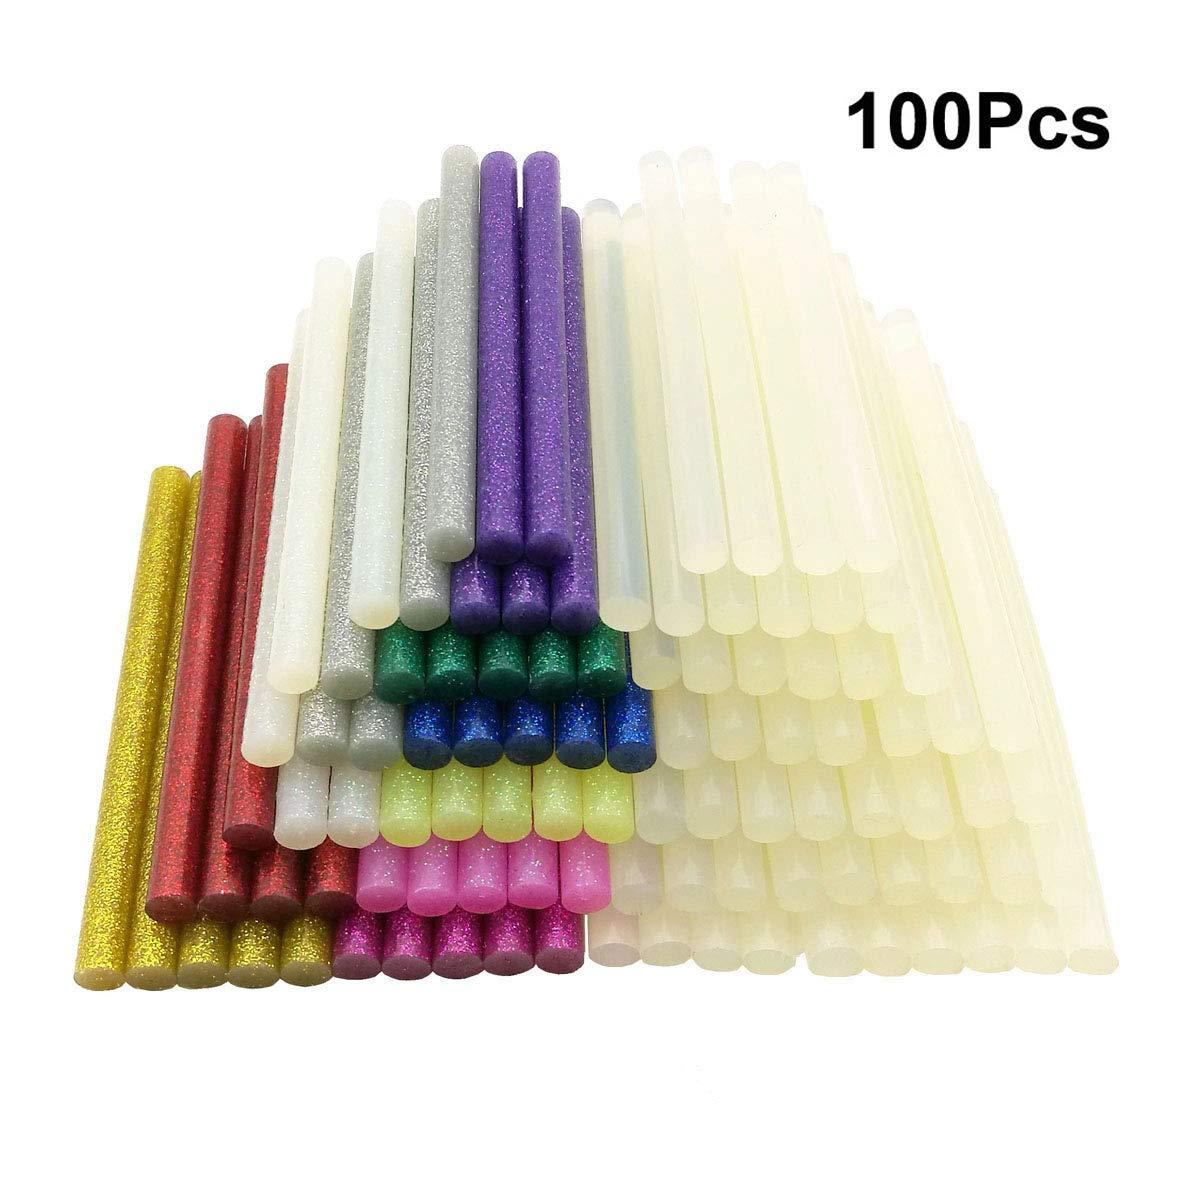 100pcs Hot Glue Sticks 7mm x 100mm for 20W Hot Melt Glue Gun, Ustation 50Pcs Ultra Clear and 50Pcs Glitter Hot Melt Glue Adhesive Sticks for DIY Art Craft, 11 Colors (7mm x 100mm)